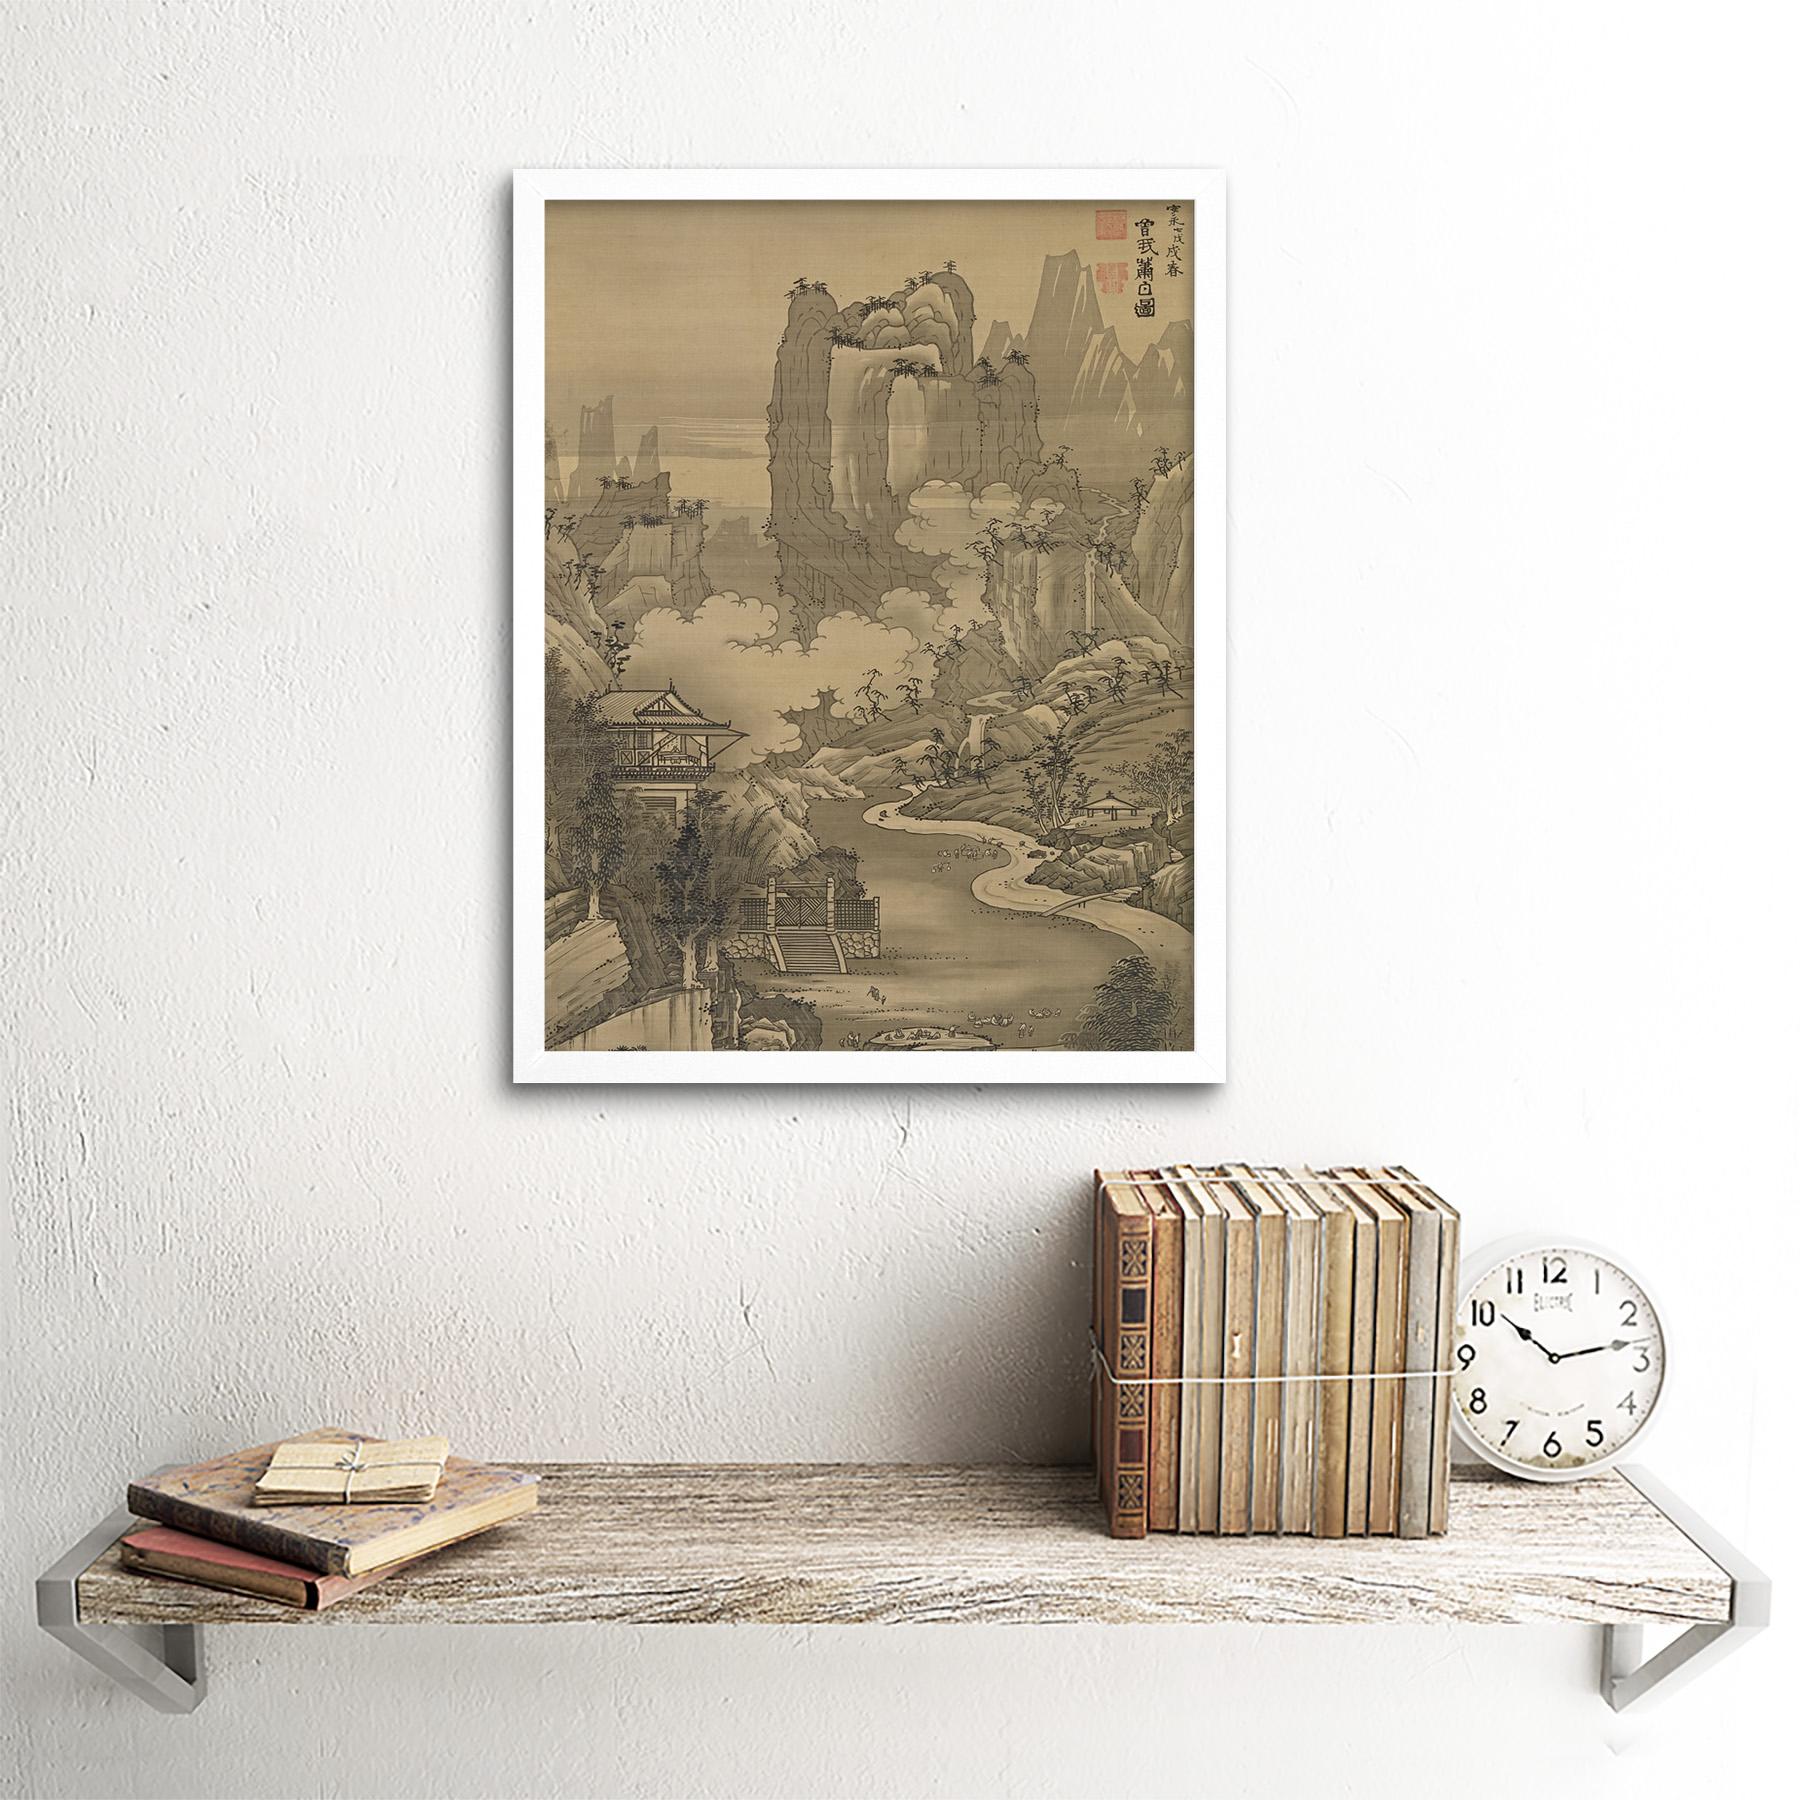 Shohaku-Orchid-Pavilion-Gathering-Screen-Painting-Wall-Art-Print-Framed-12x16 thumbnail 18